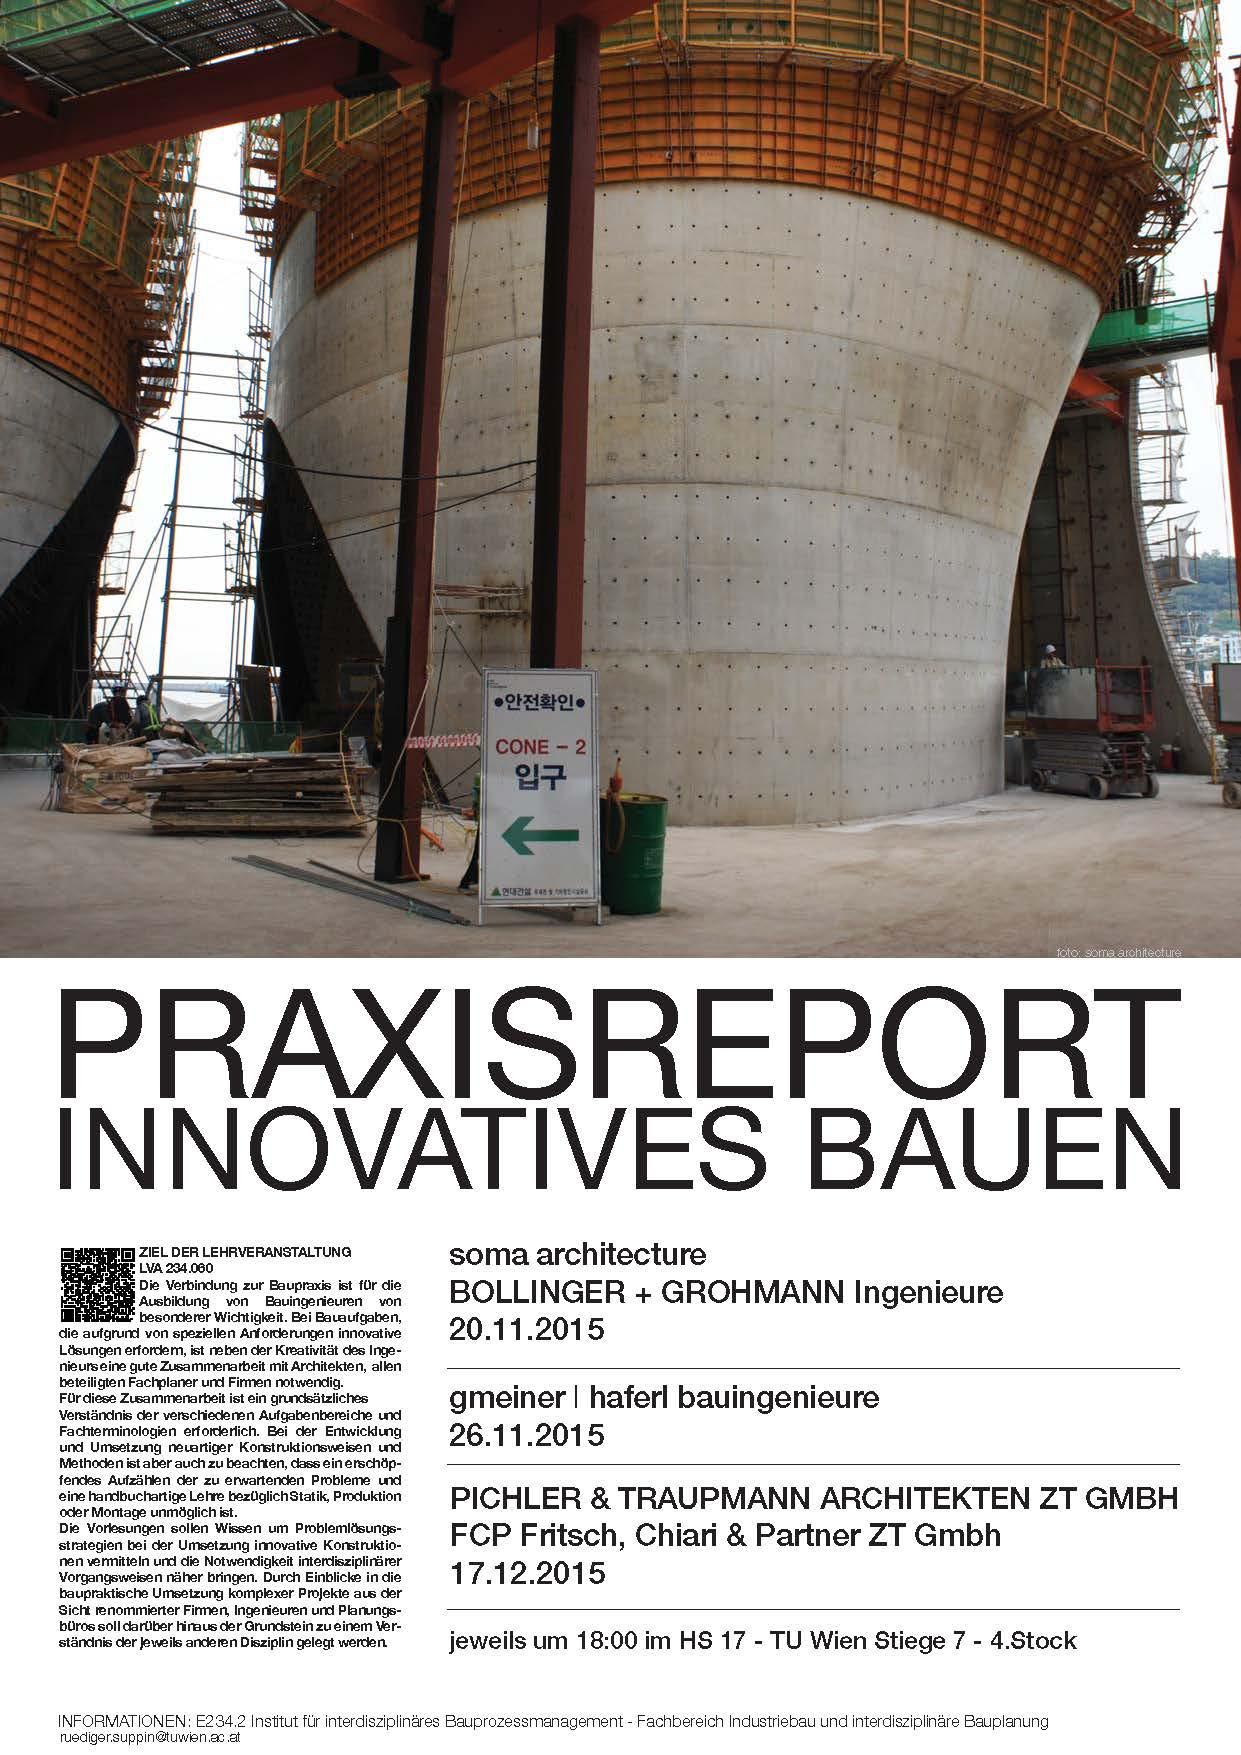 TU praxis report